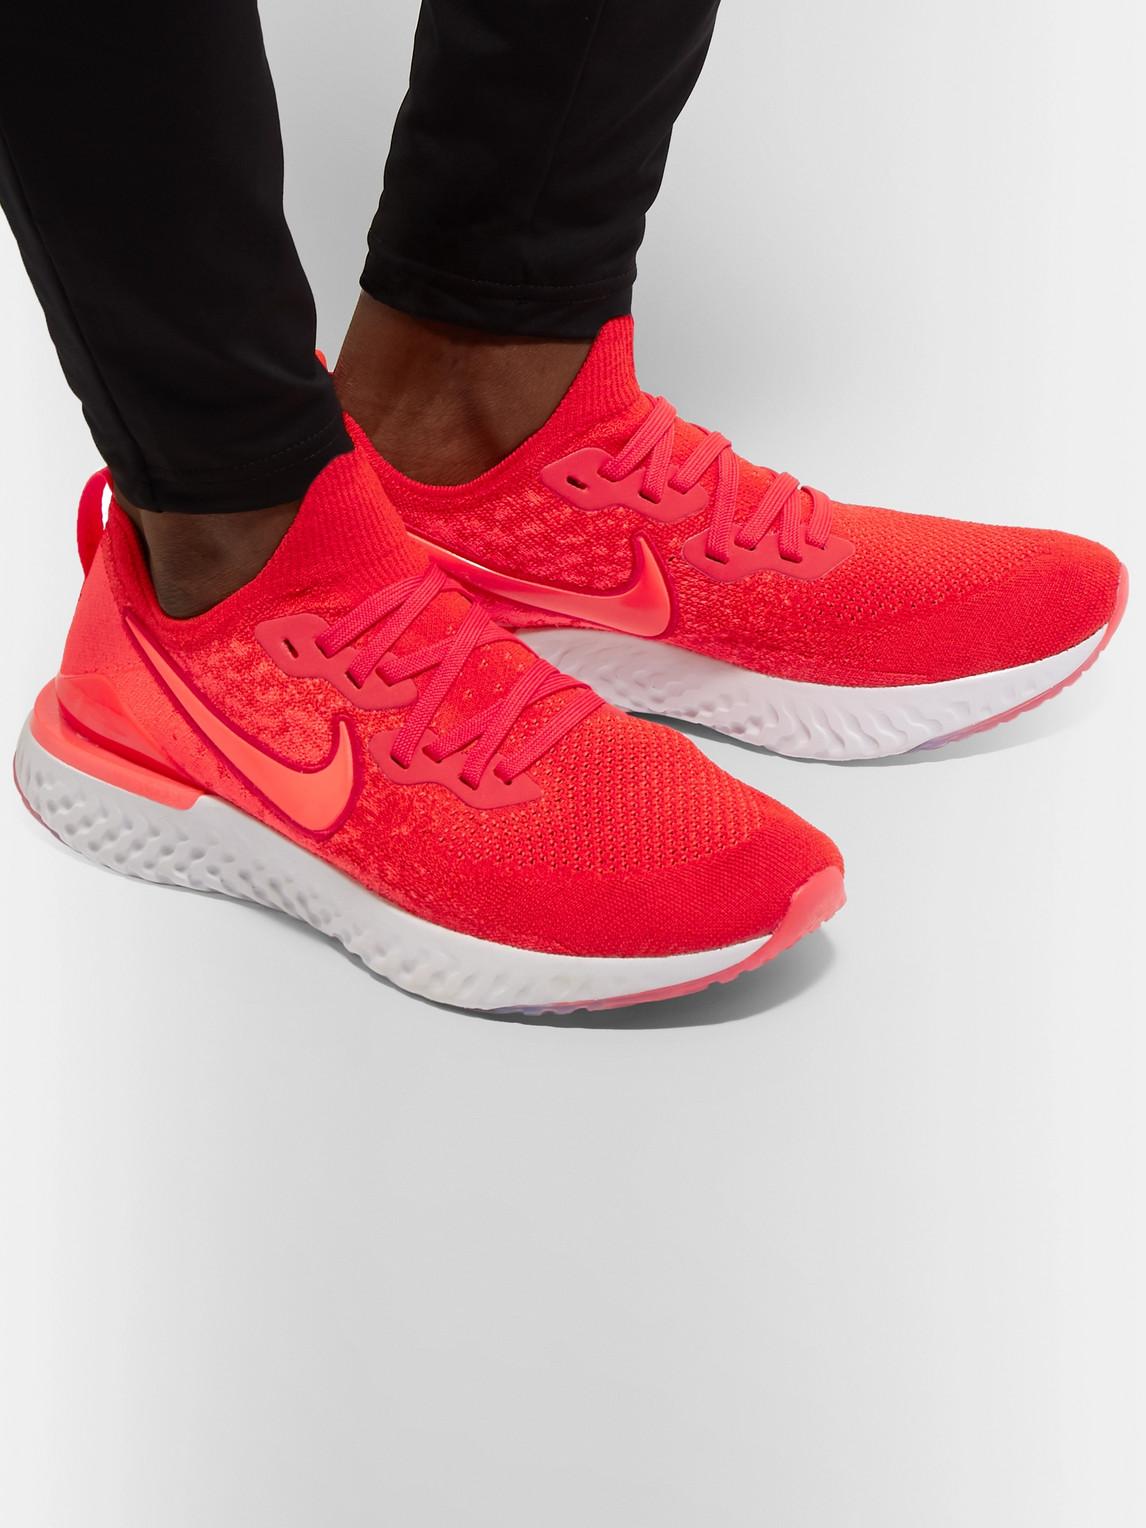 Nike Sneakers EPIC REACT FLYKNIT 2 RUNNING SNEAKERS